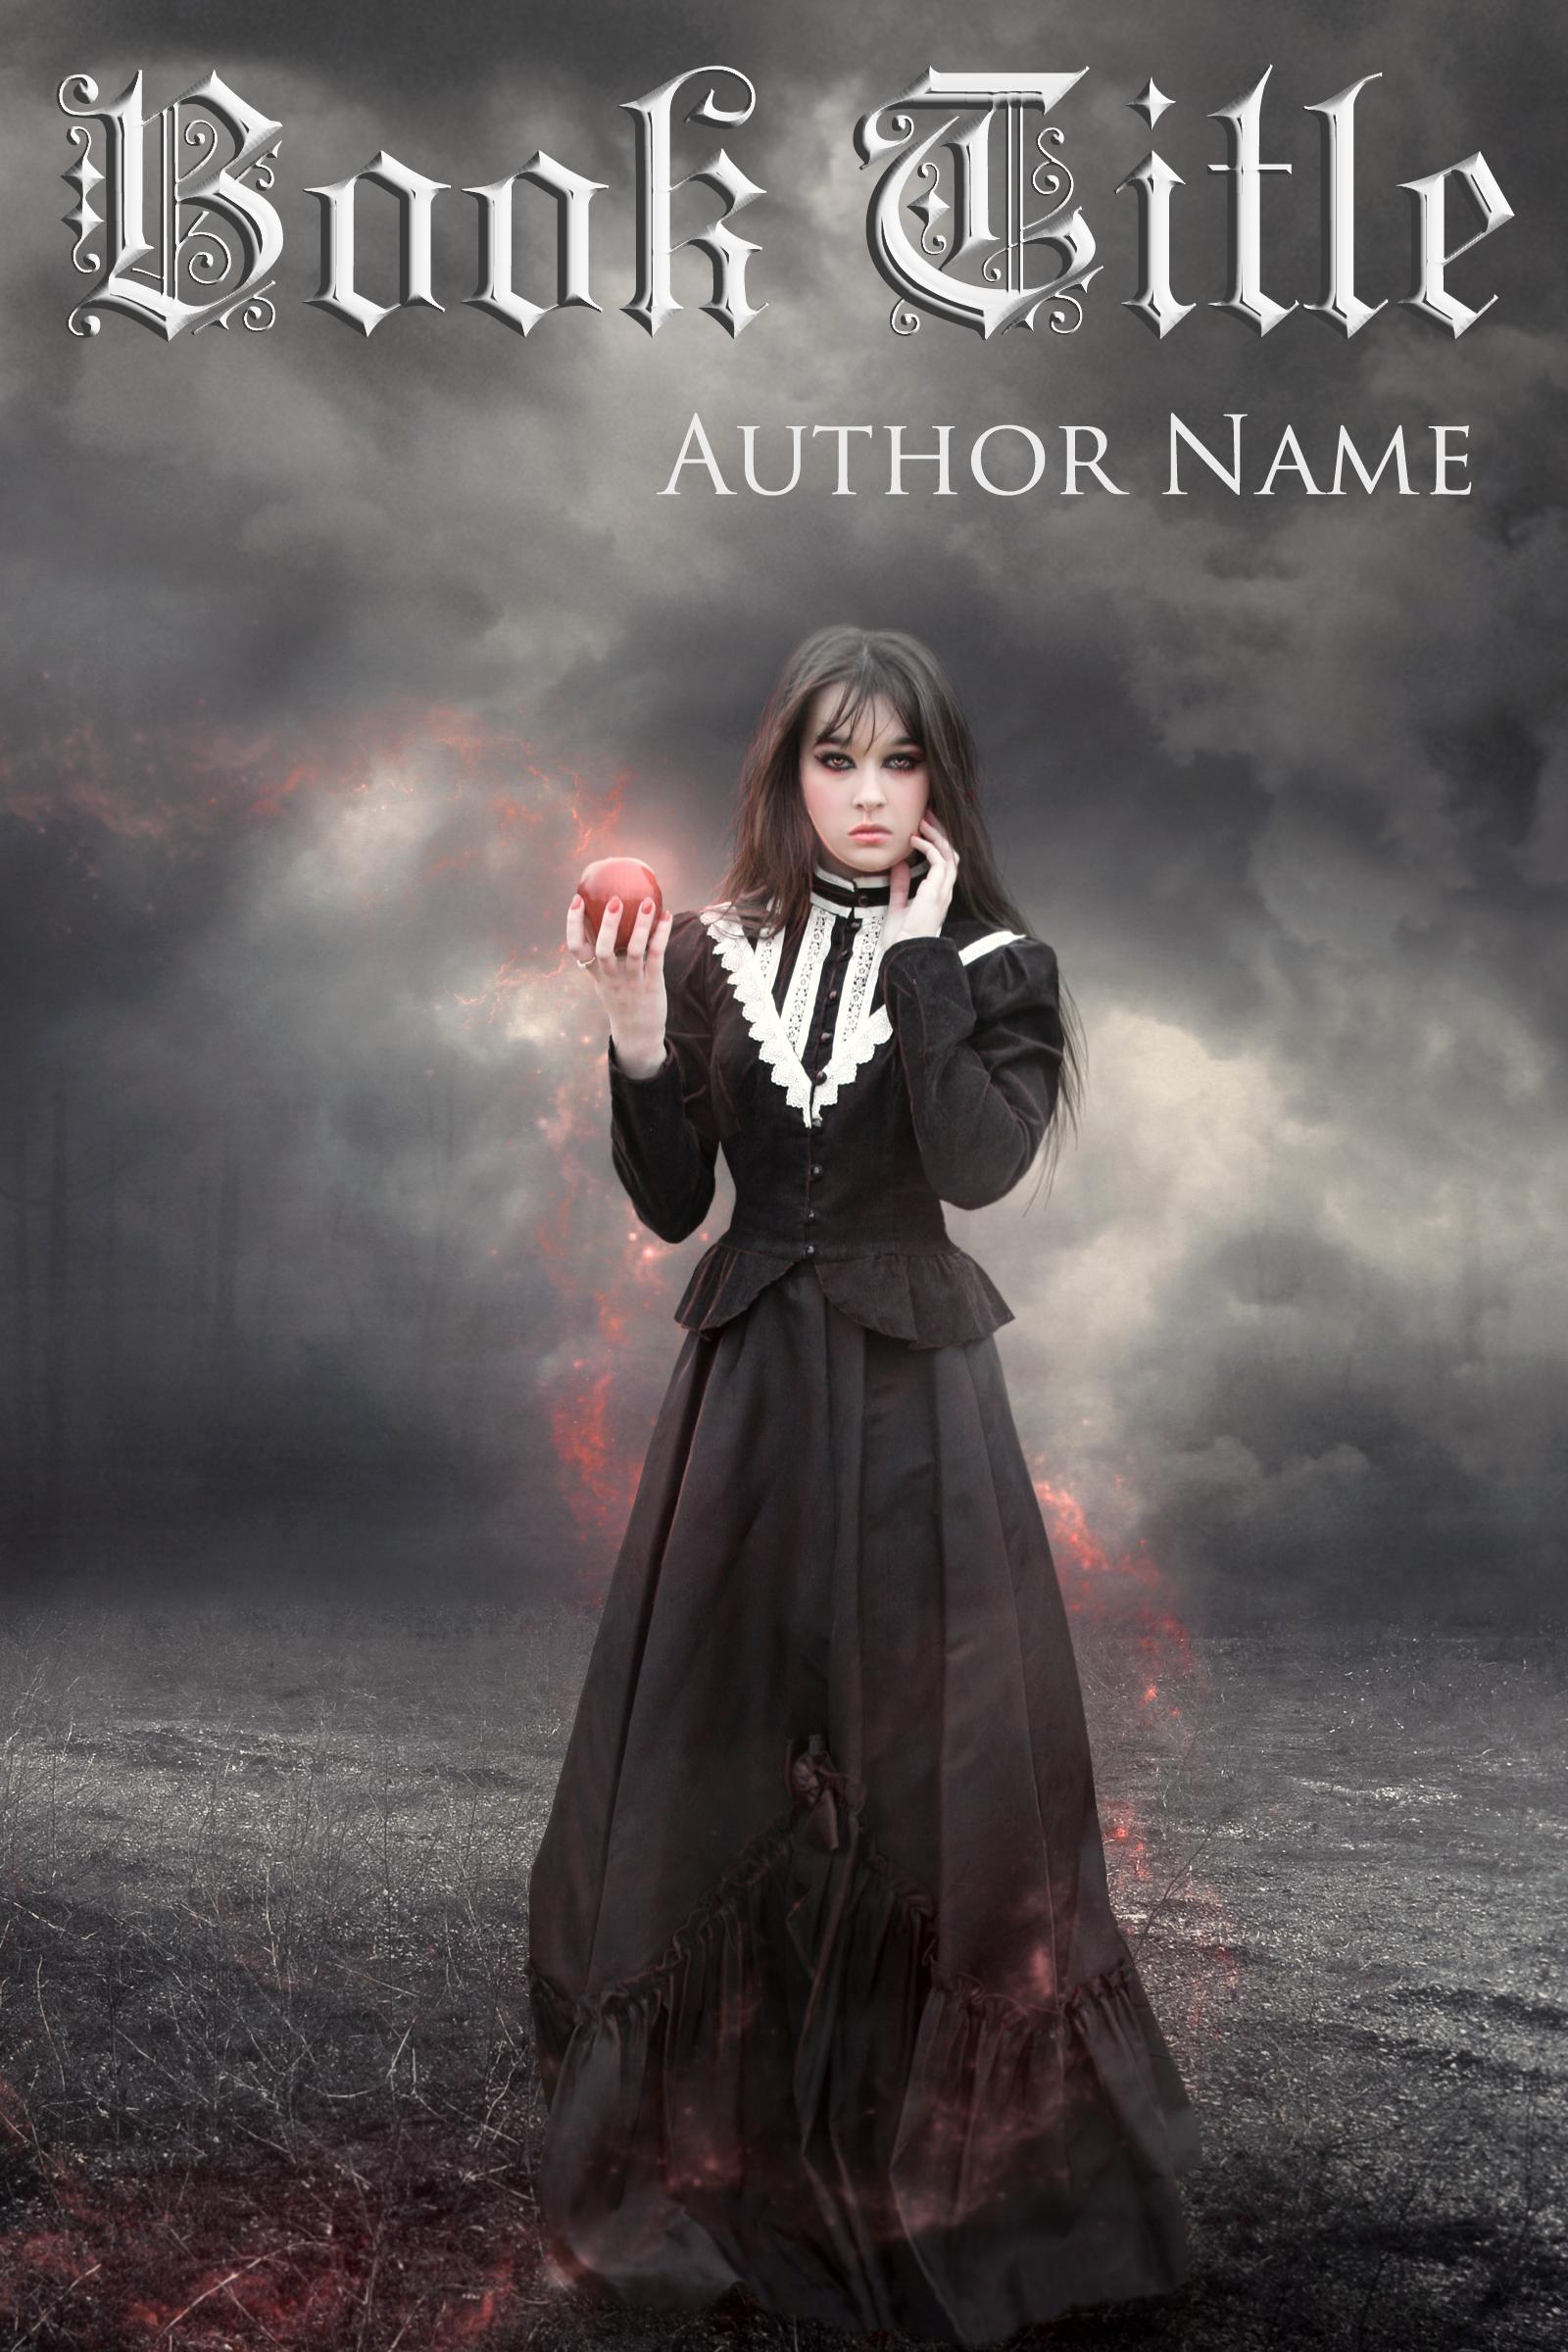 Book Cover Inspiration : Inspiration the book cover designer